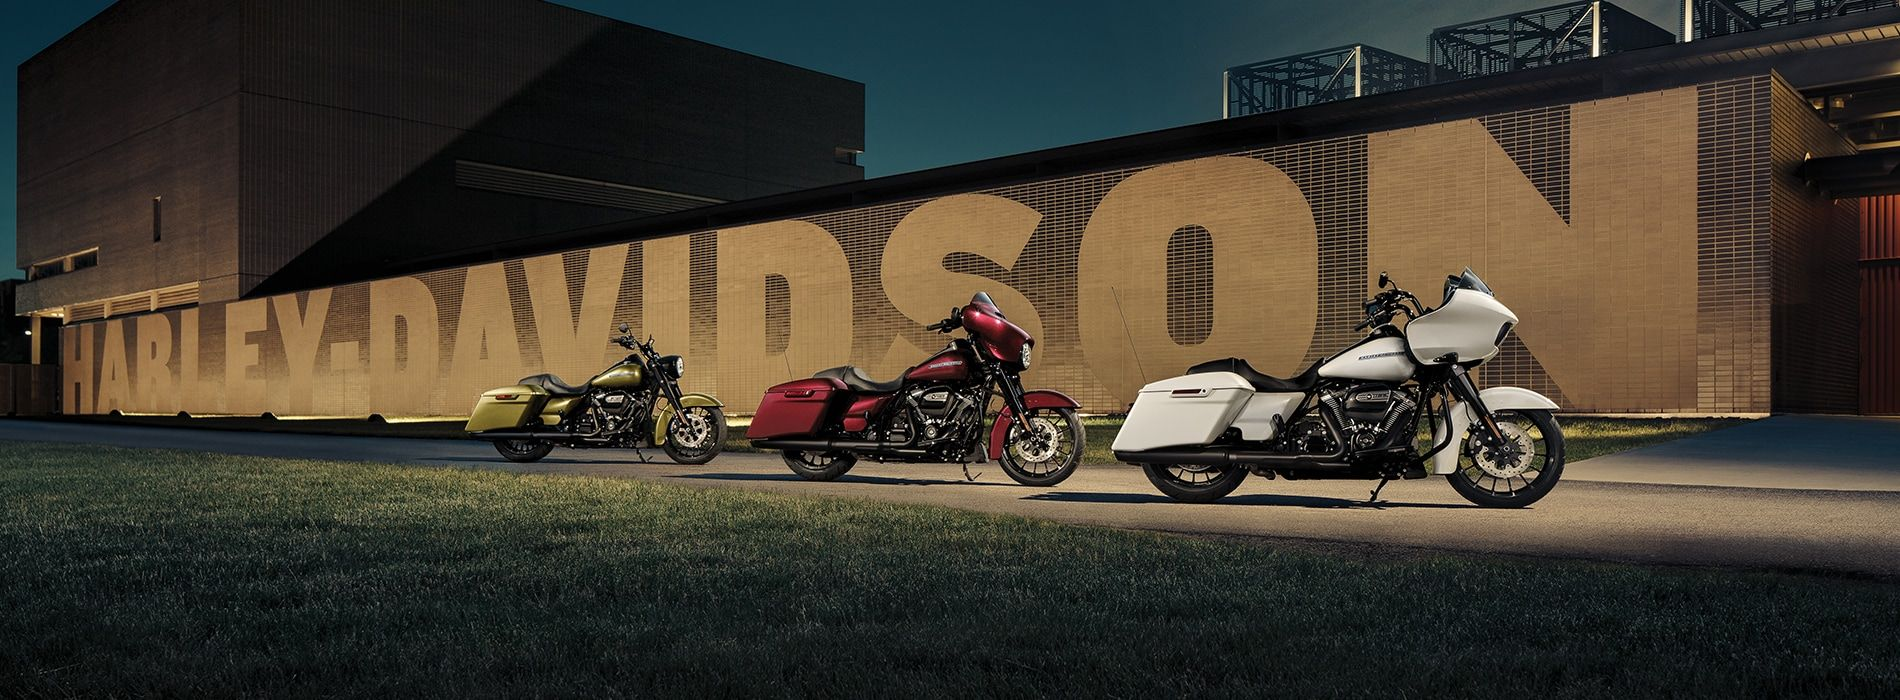 2018 Harley Davidson Wallpapers Harley davidson